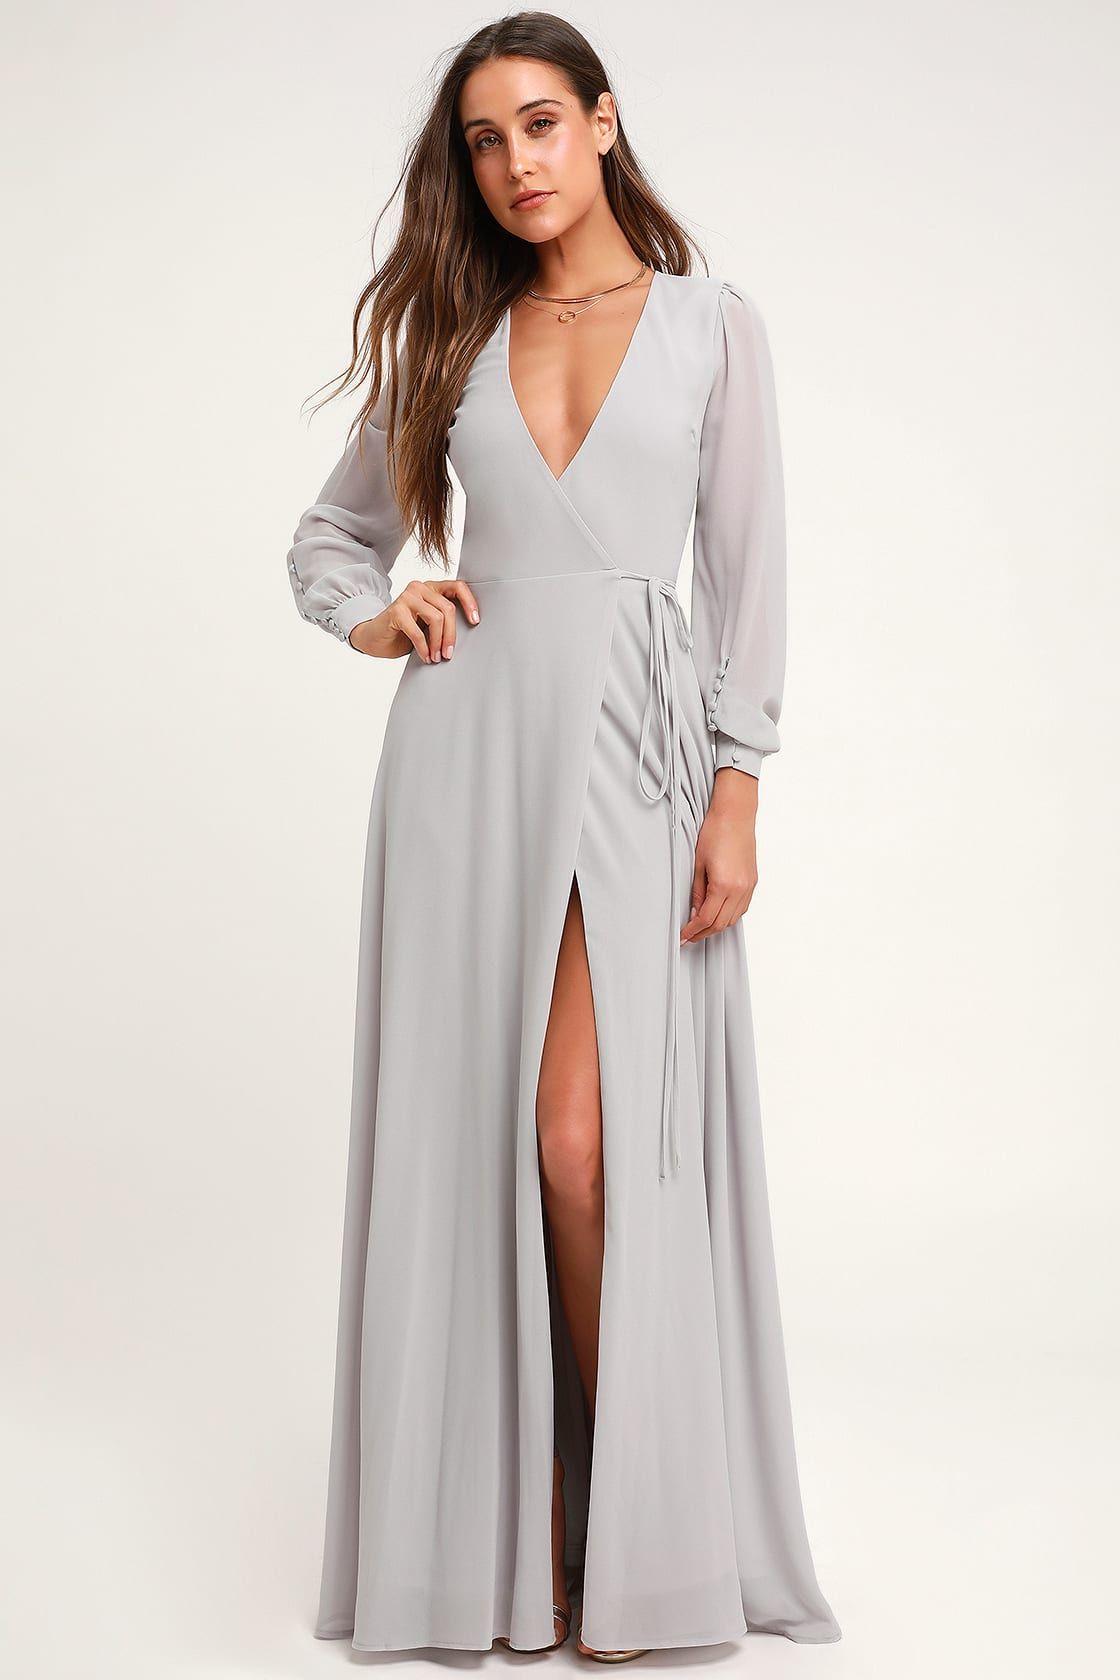 My Whole Heart Light Grey Long Sleeve Wrap Maxi Dress Grey Maxi Dress Maxi Dress Grey Long Sleeve Dress [ 1680 x 1120 Pixel ]